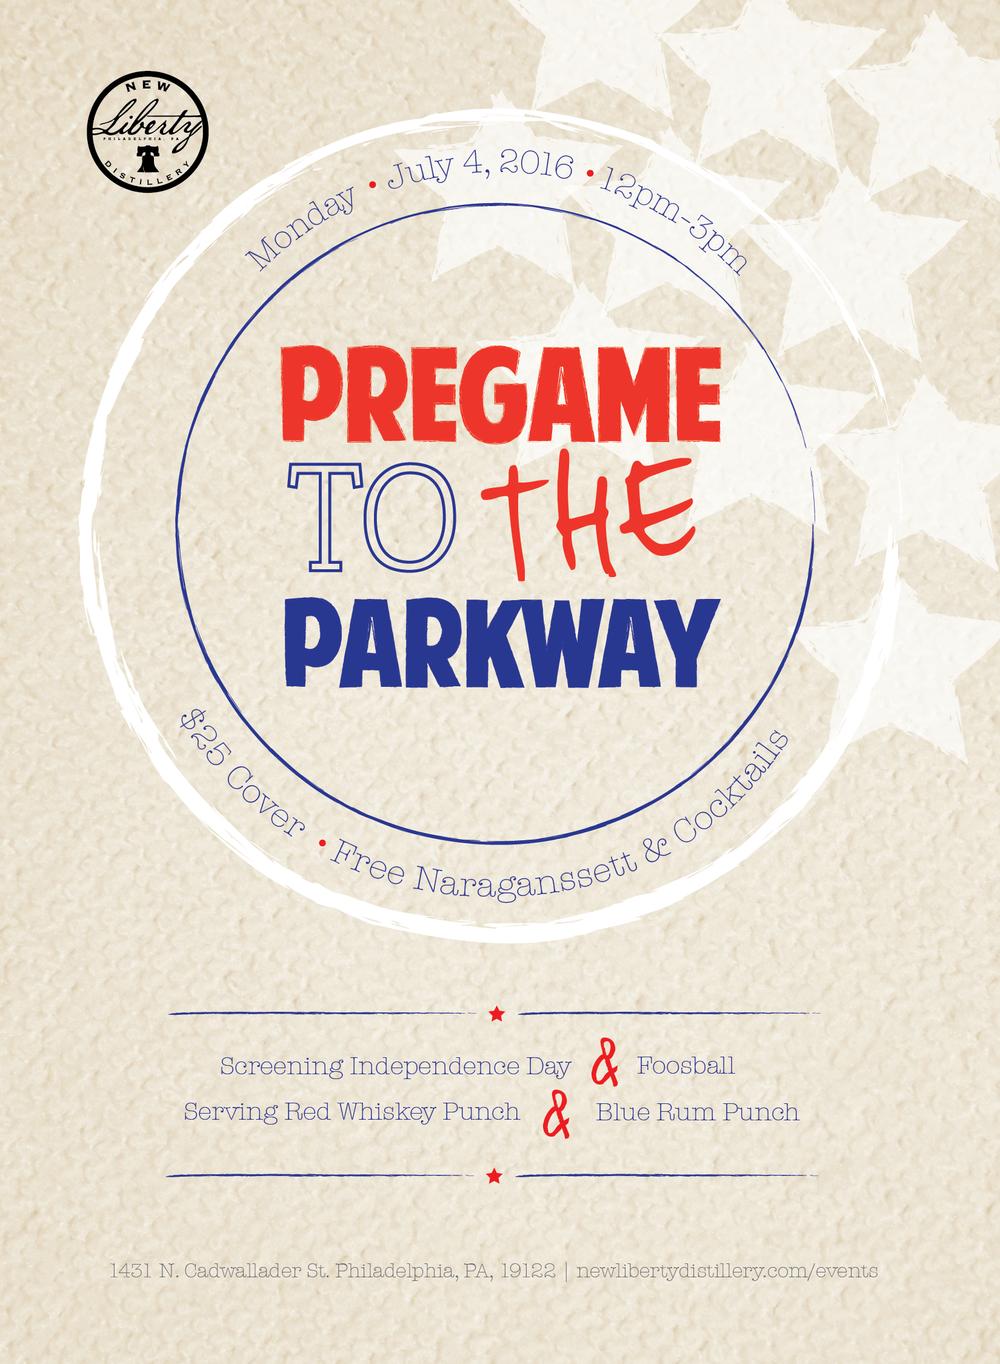 PregameToTheParkway-03.png